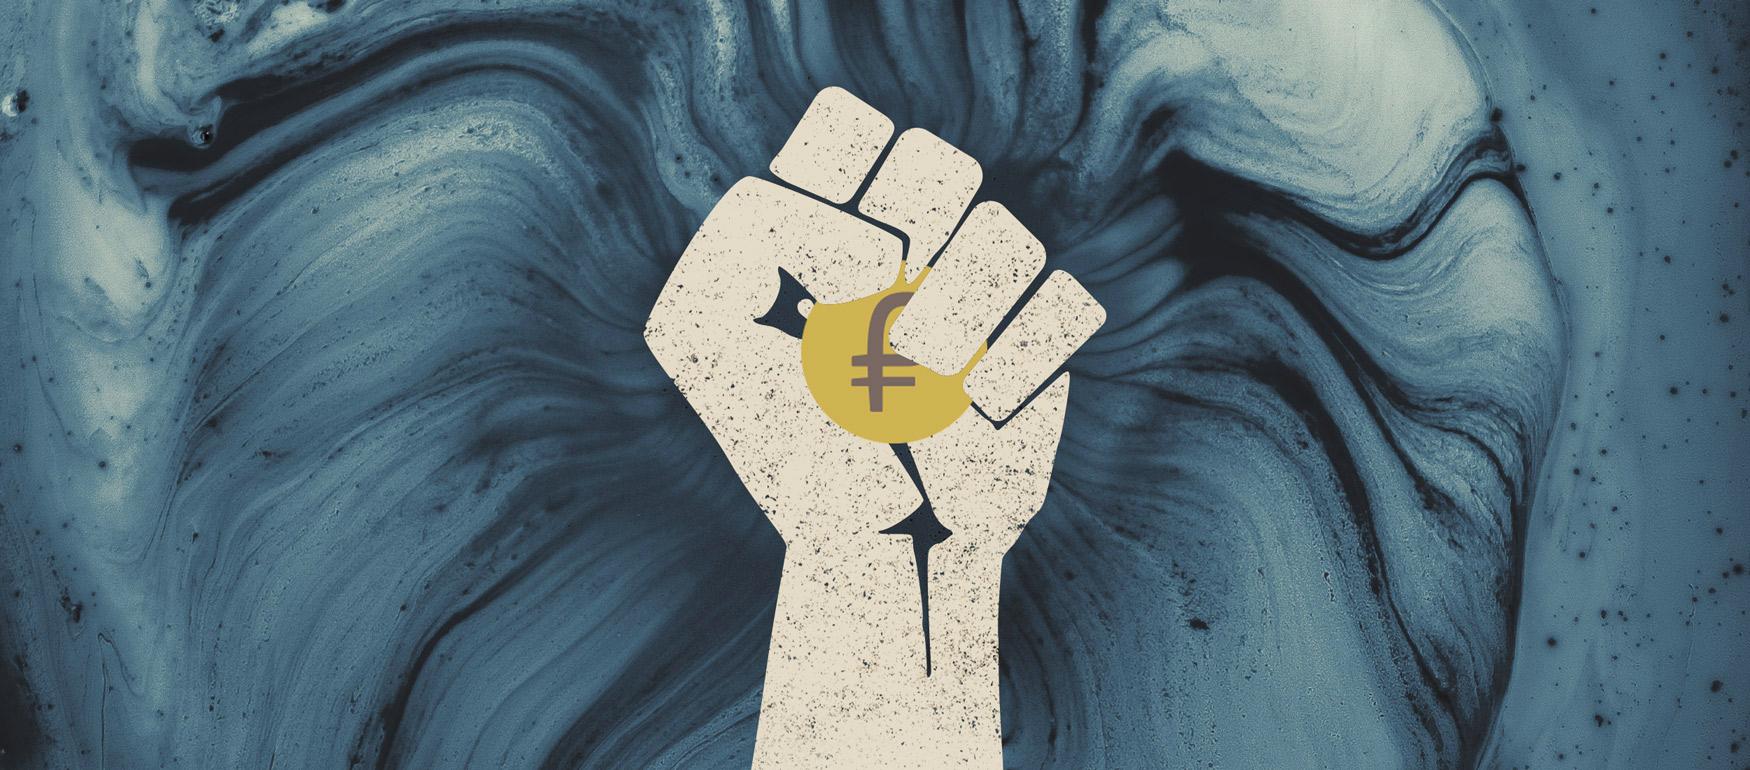 Authoritarian ICO: How Venezuela's Government Is Abusing the Blockchain